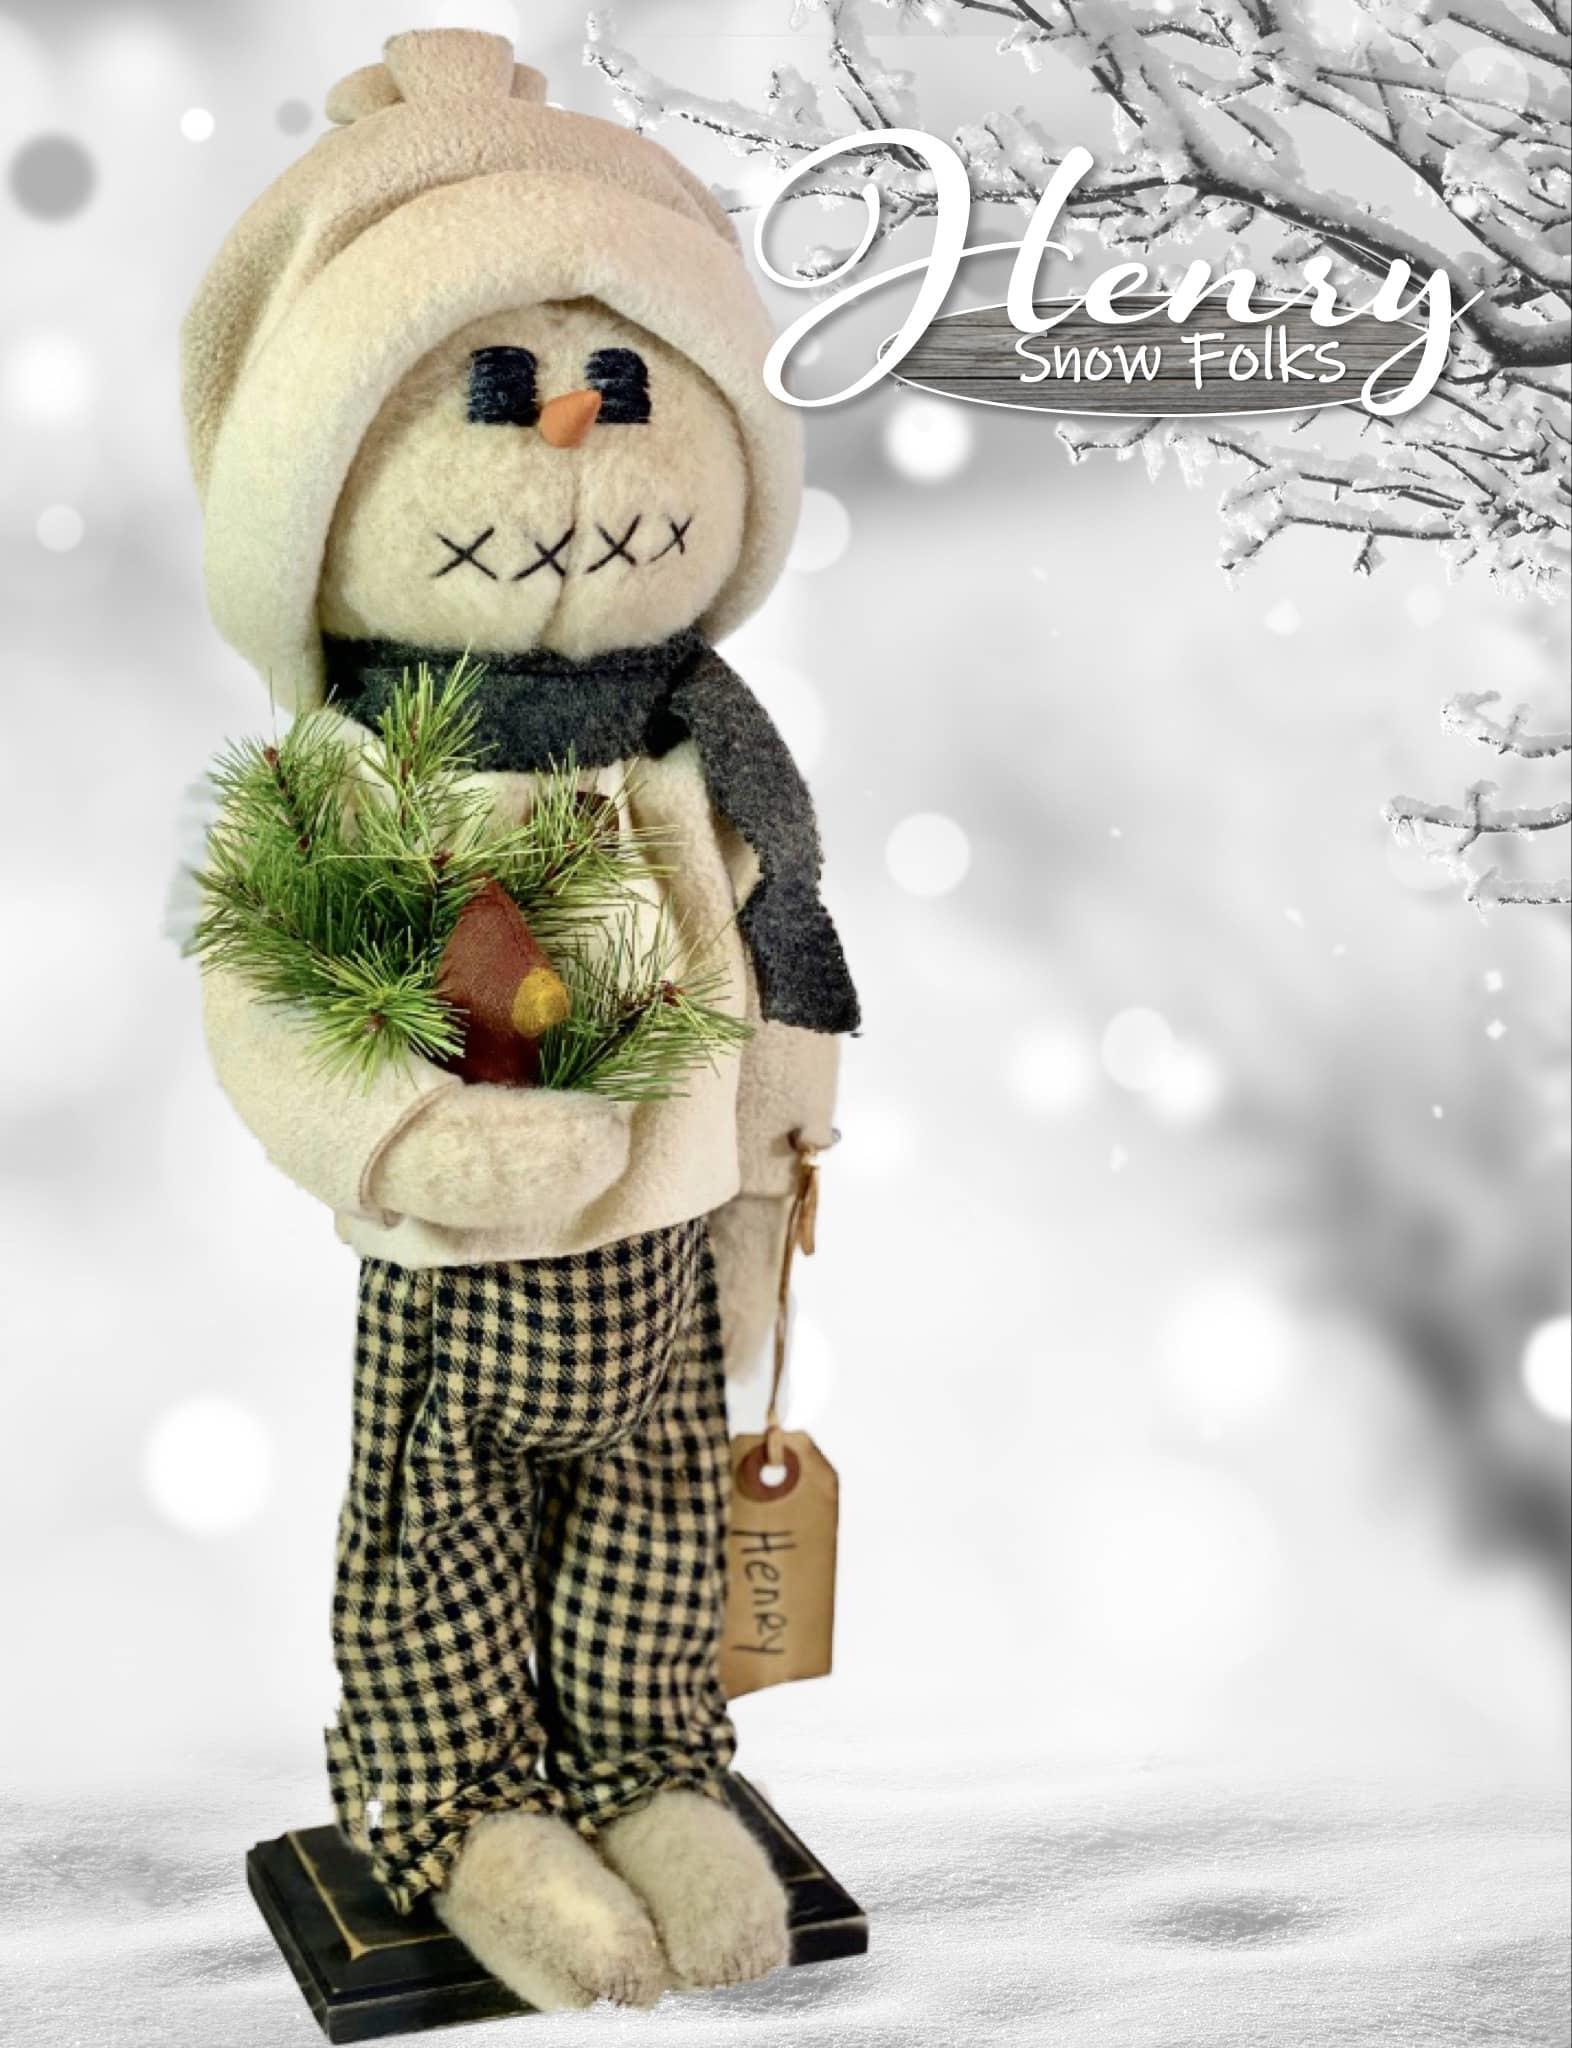 Nana's Farmhouse Henry The Snow Boy Plaid Pants Holding Cardinal & Greens